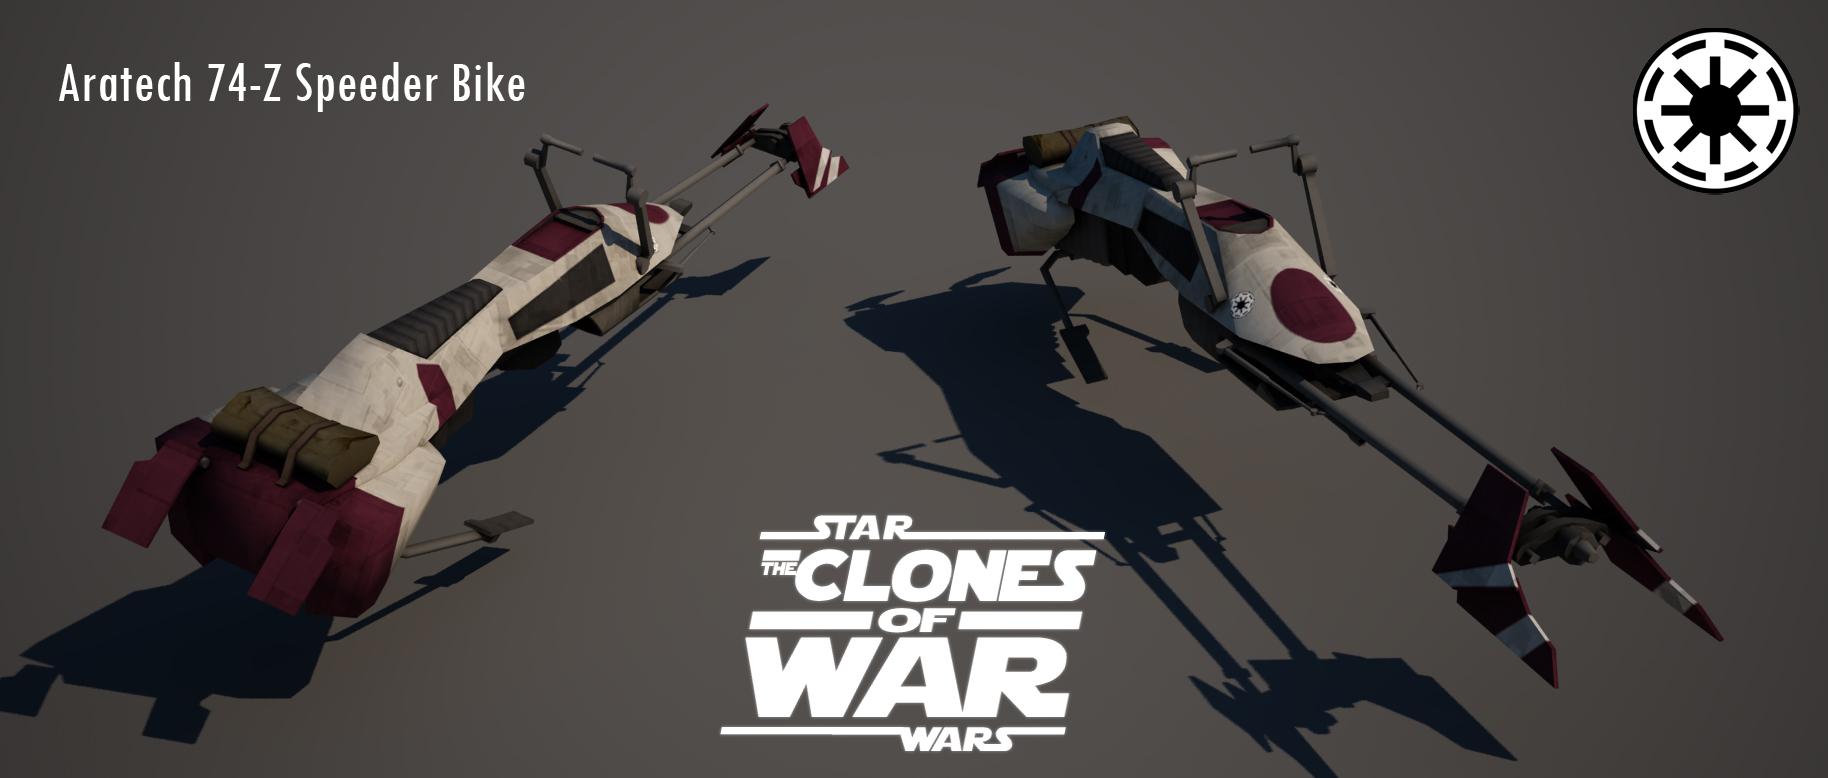 The aratech 74 z speeder bike image star wars the clones of war mod